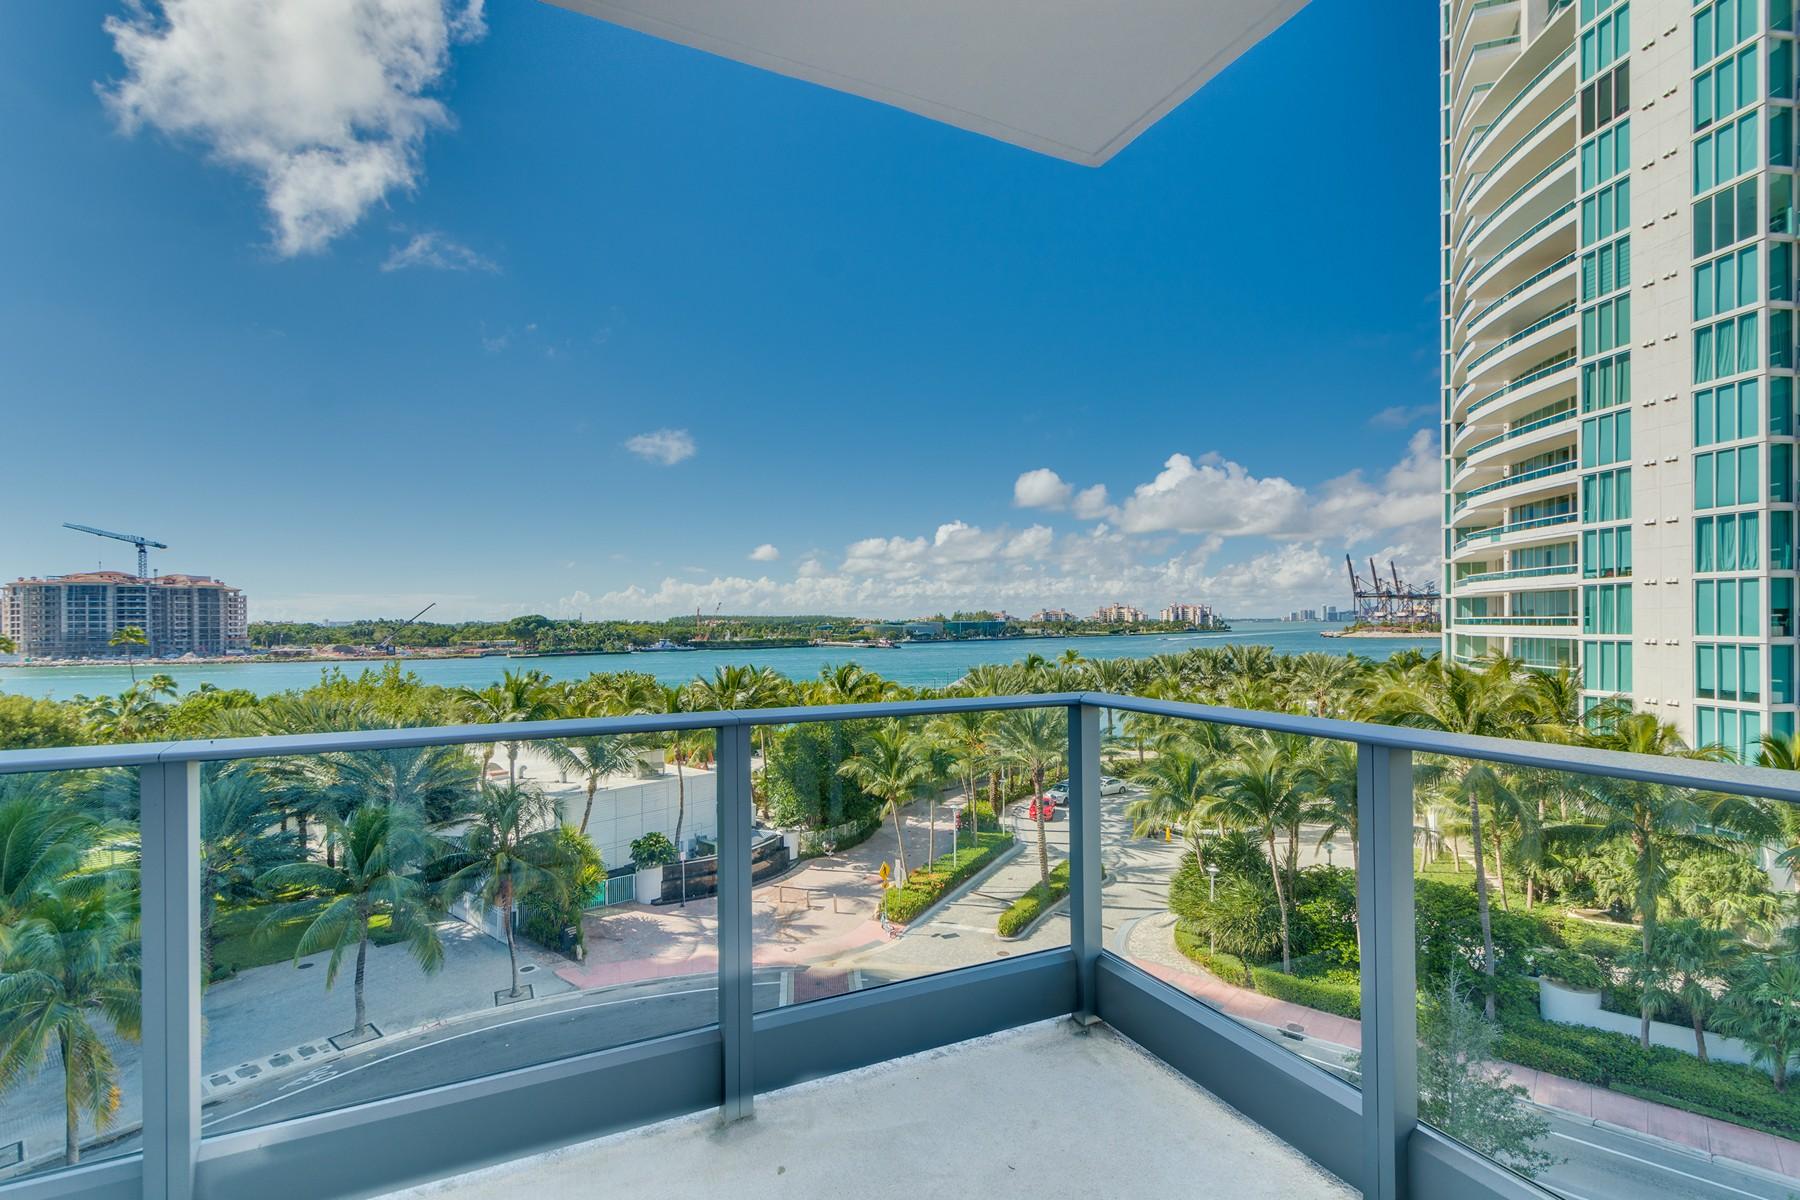 Condominium for Sale at 801 S Pointe Dr #501 801 S Pointe Dr 501 Miami Beach, Florida, 33139 United States